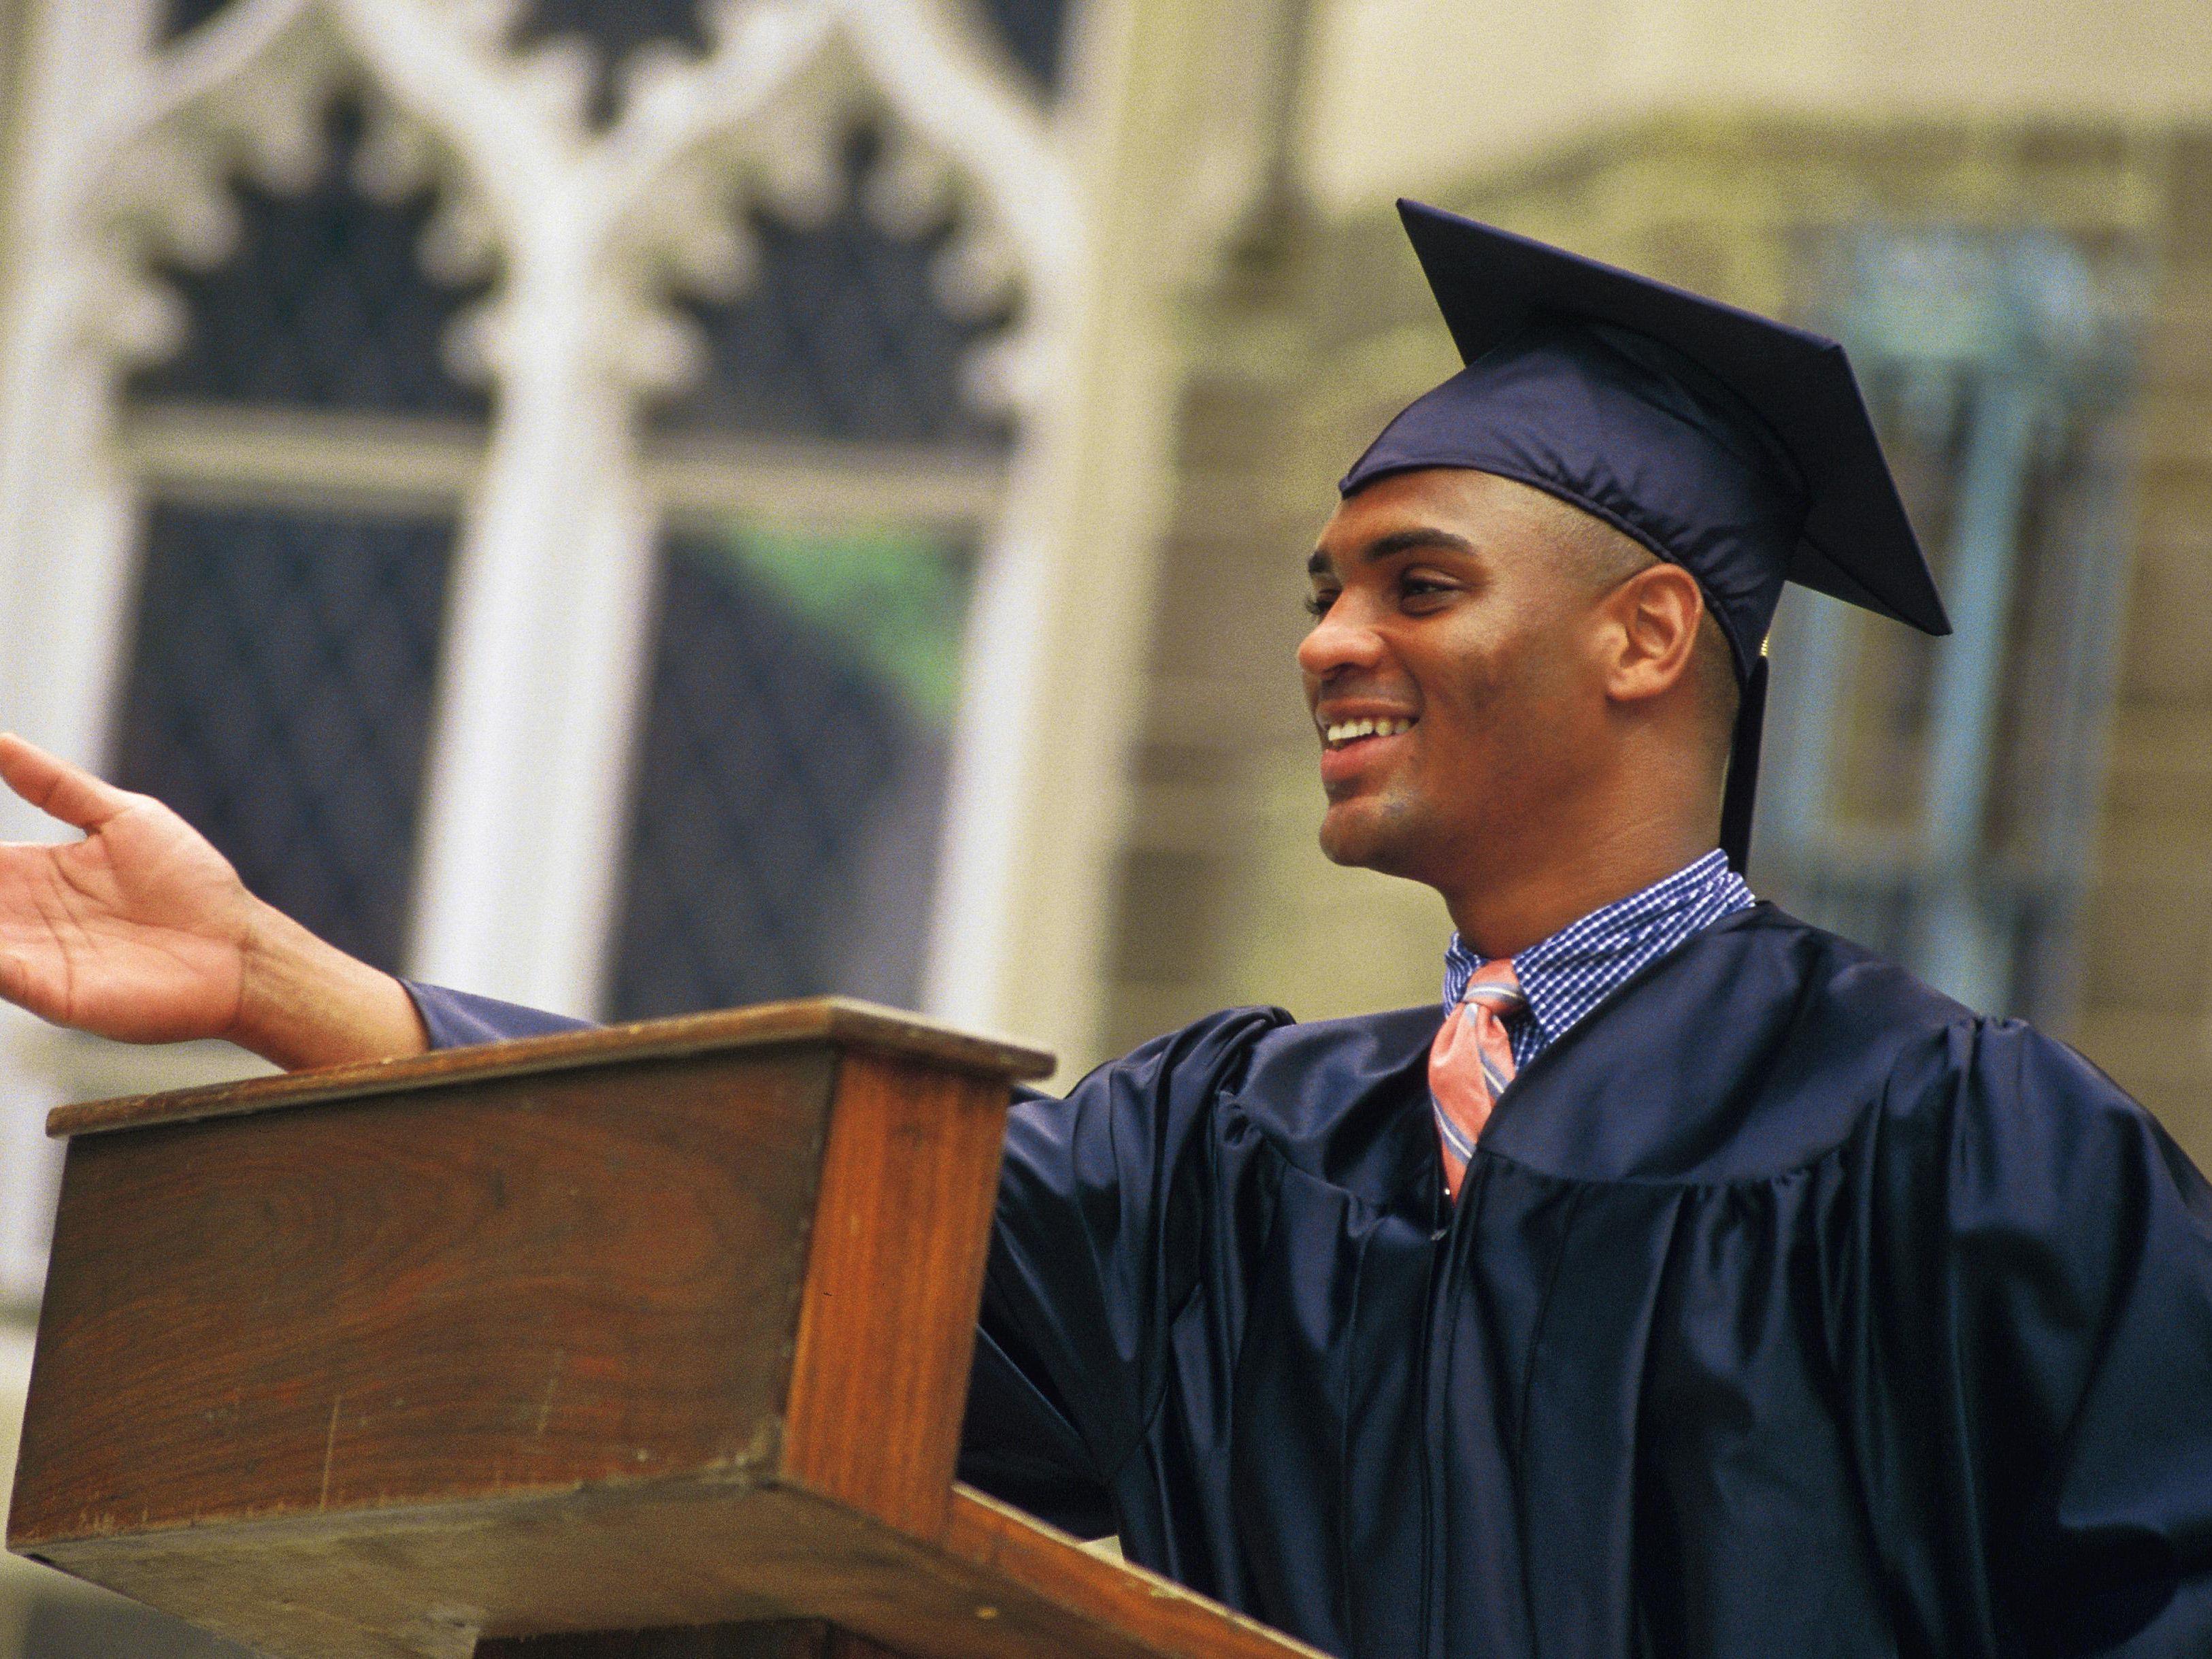 How to Write a Graduation Speech as Valedictorian